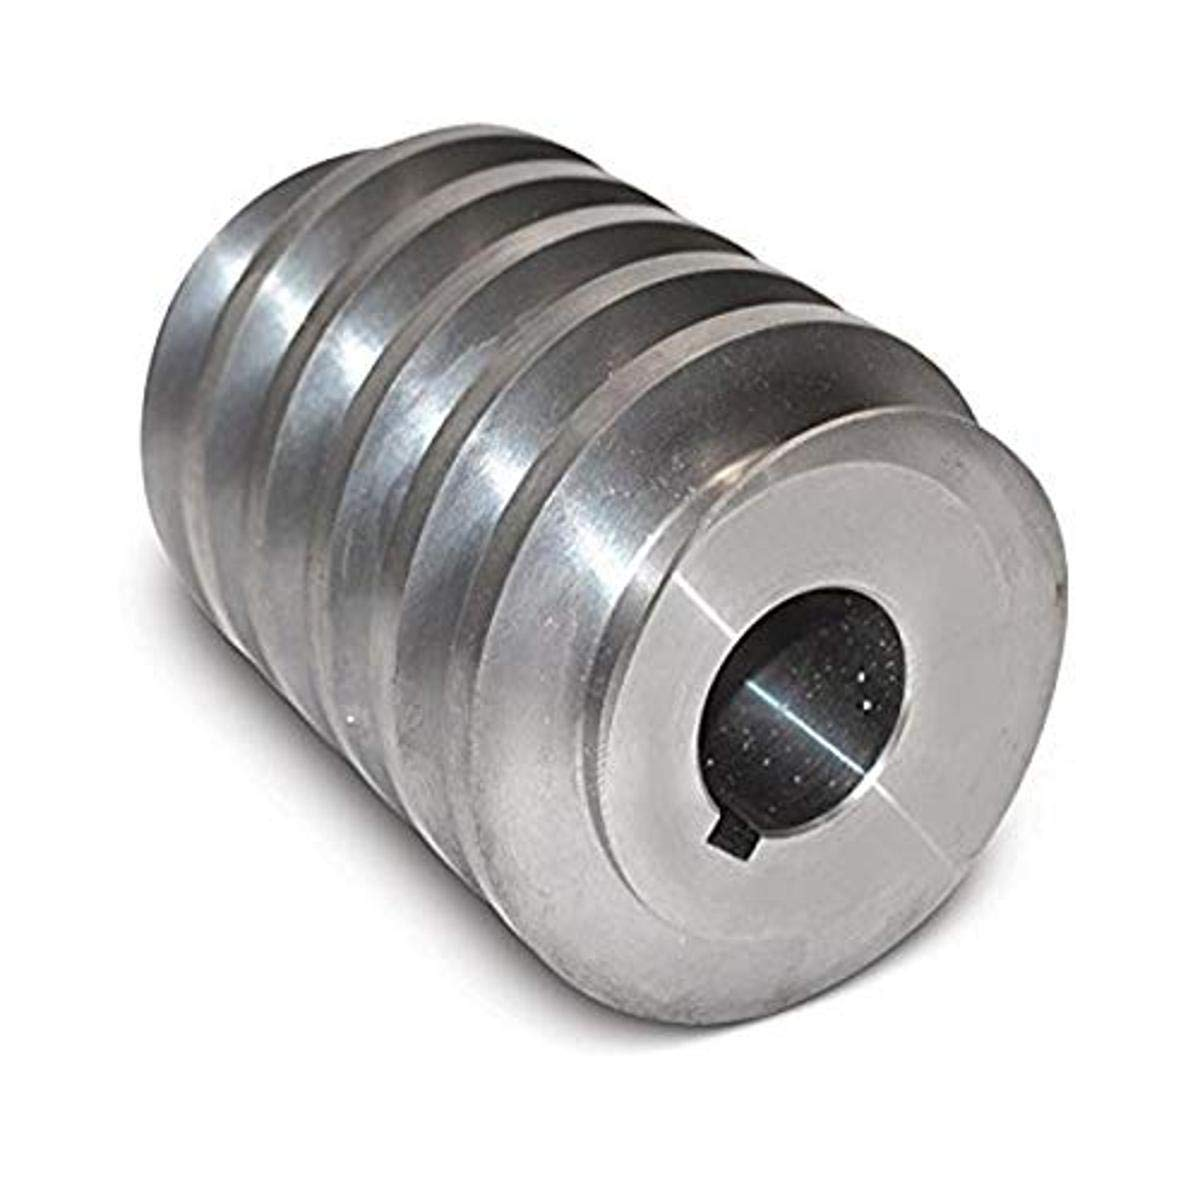 0.875 Bore 1.5 PD 14.5 Degree Pressure Angle Boston Gear H1427LH Worm Gear LH 8 Pitch